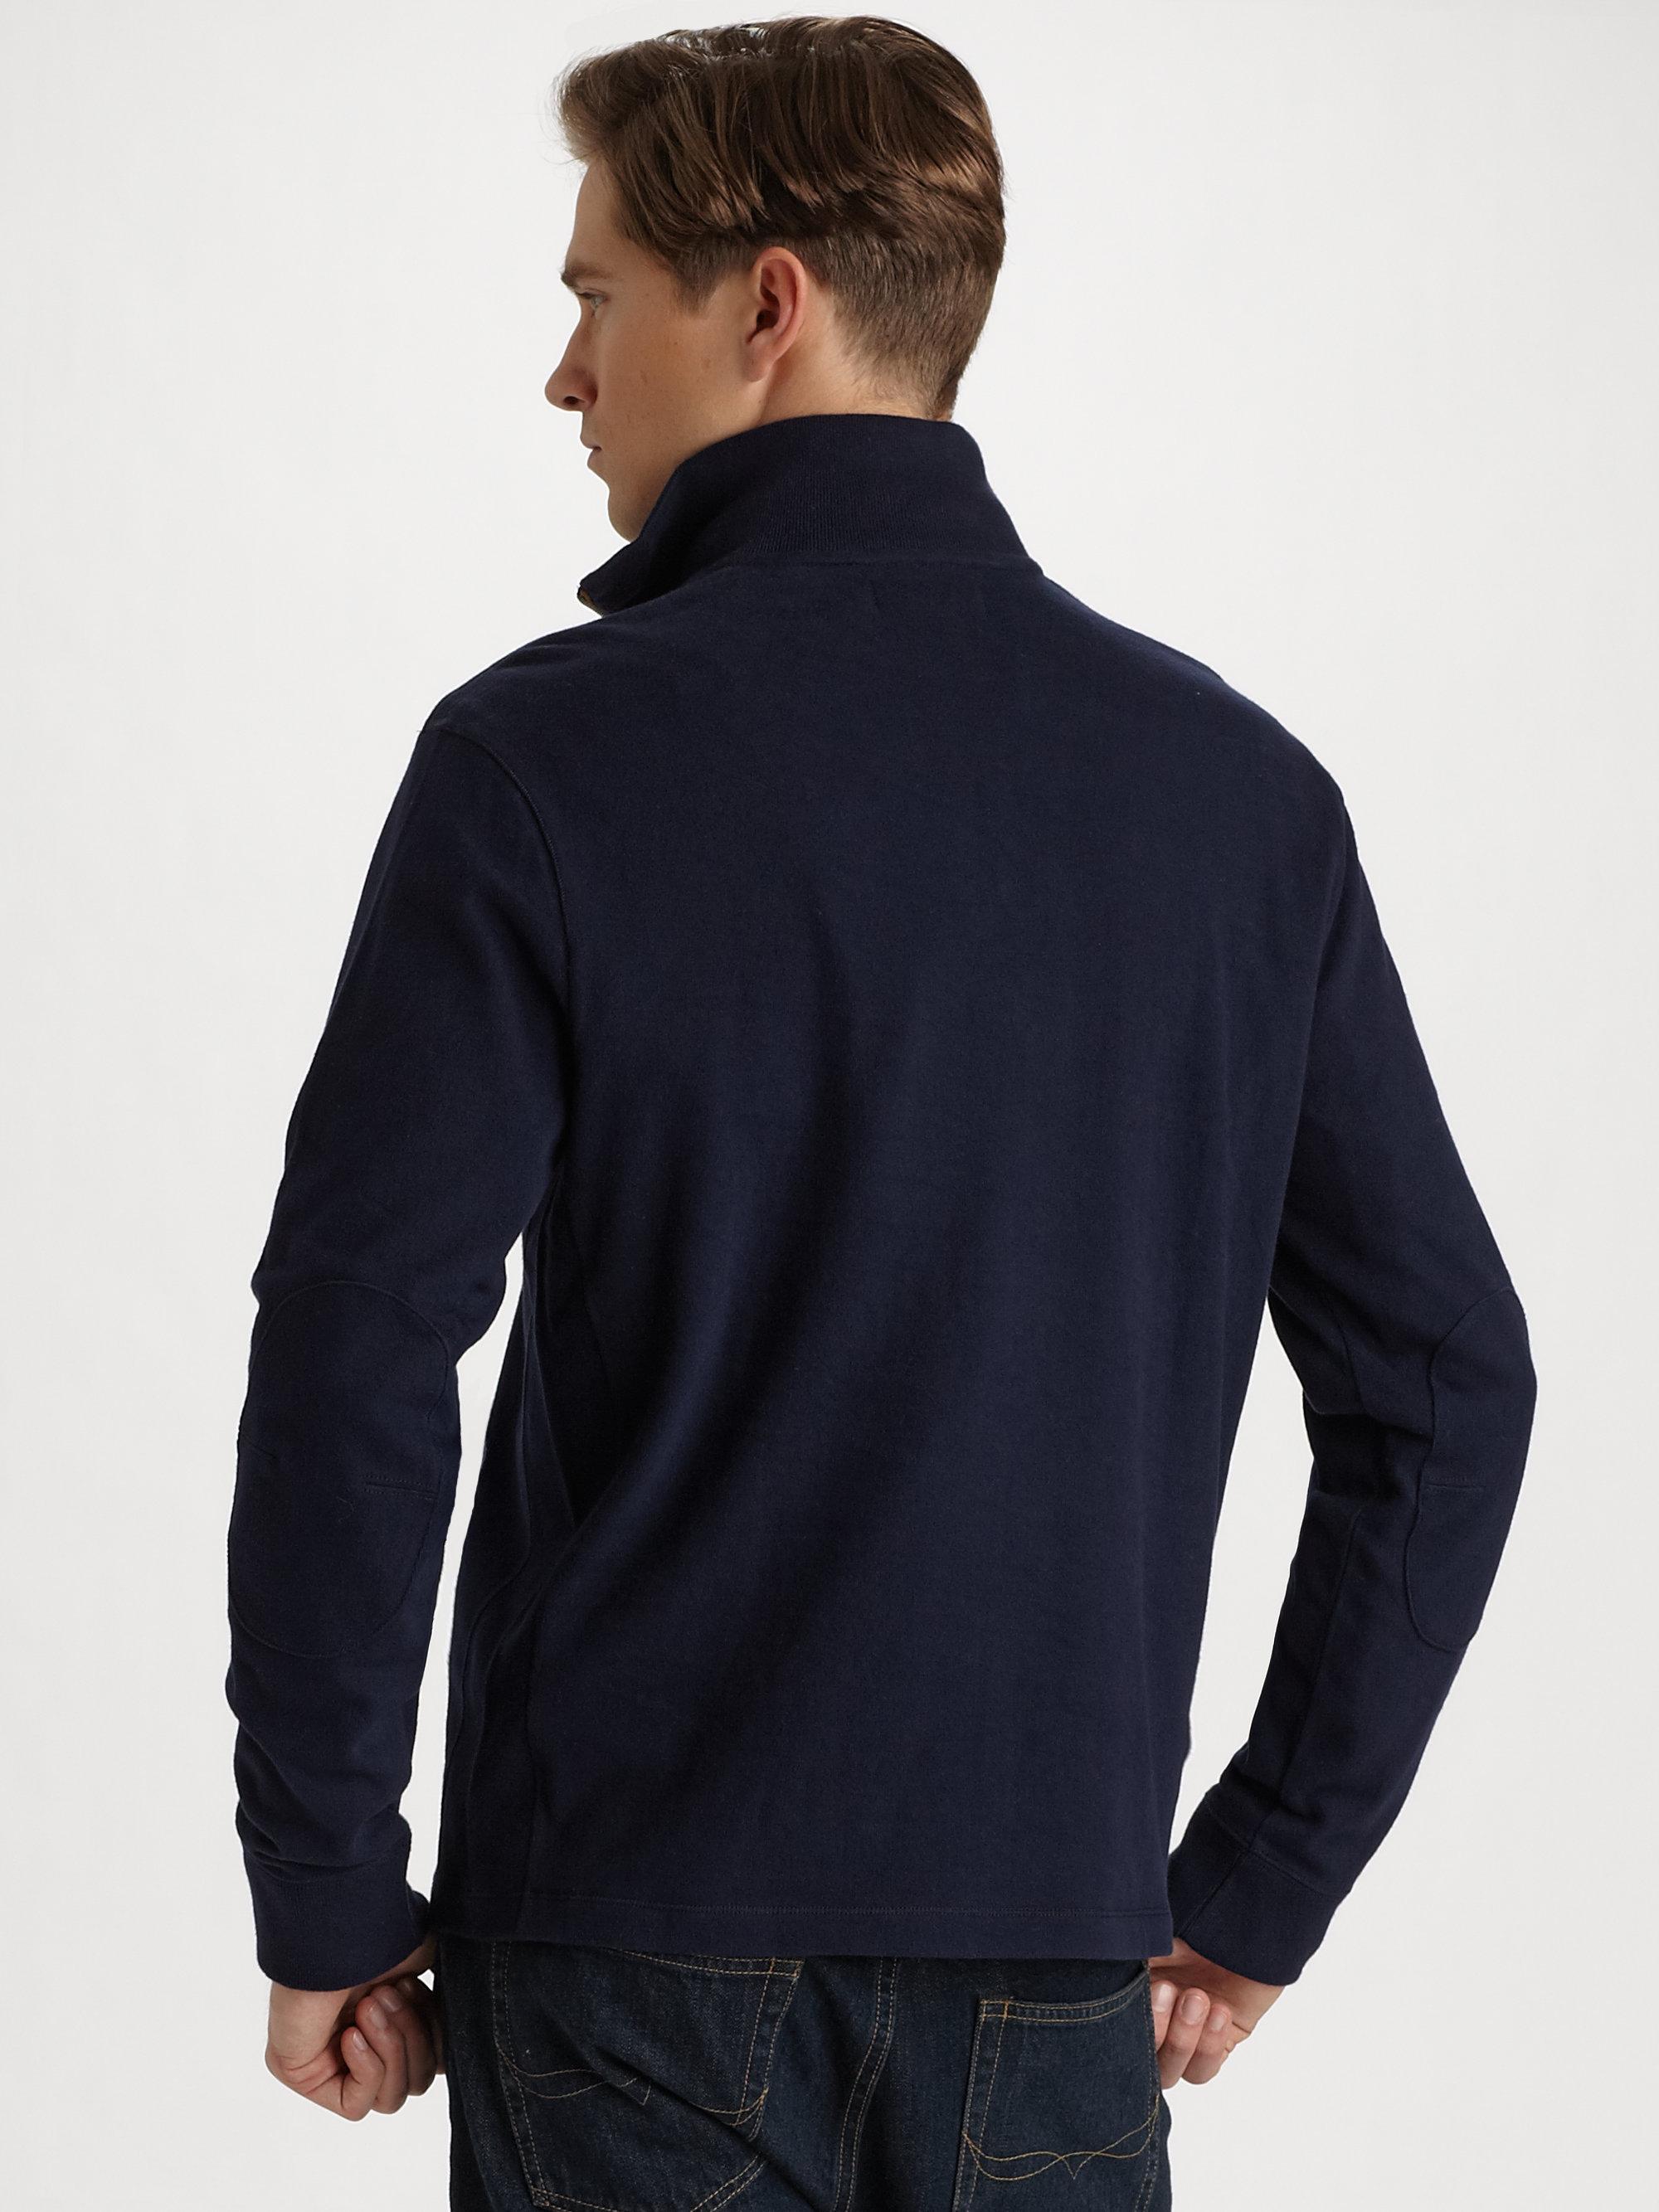 polo ralph lauren fleece halfzip pullover in blue for men. Black Bedroom Furniture Sets. Home Design Ideas